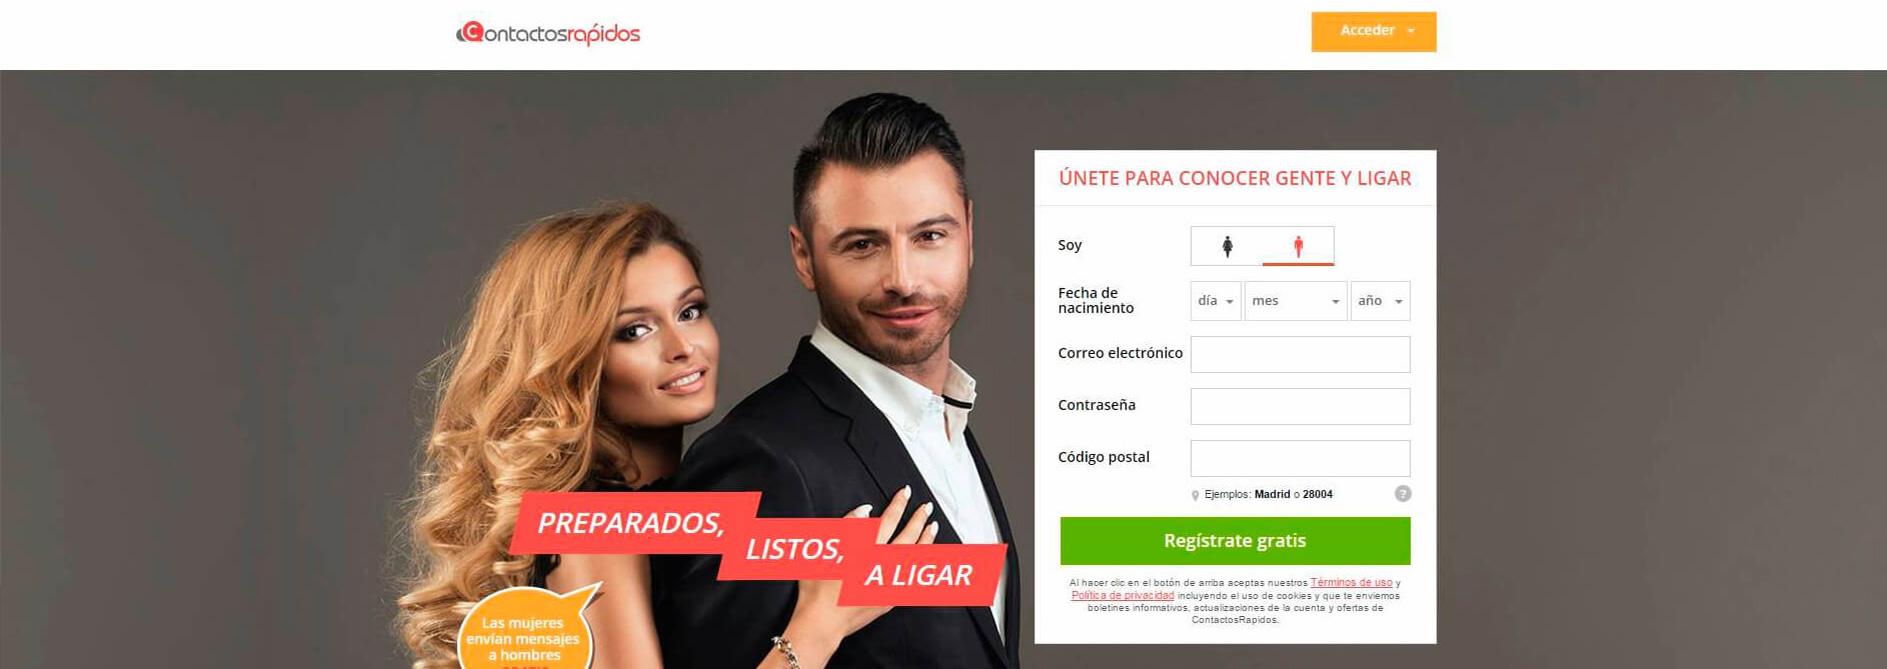 Contactos rapidos gay madrid [PUNIQRANDLINE-(au-dating-names.txt) 22